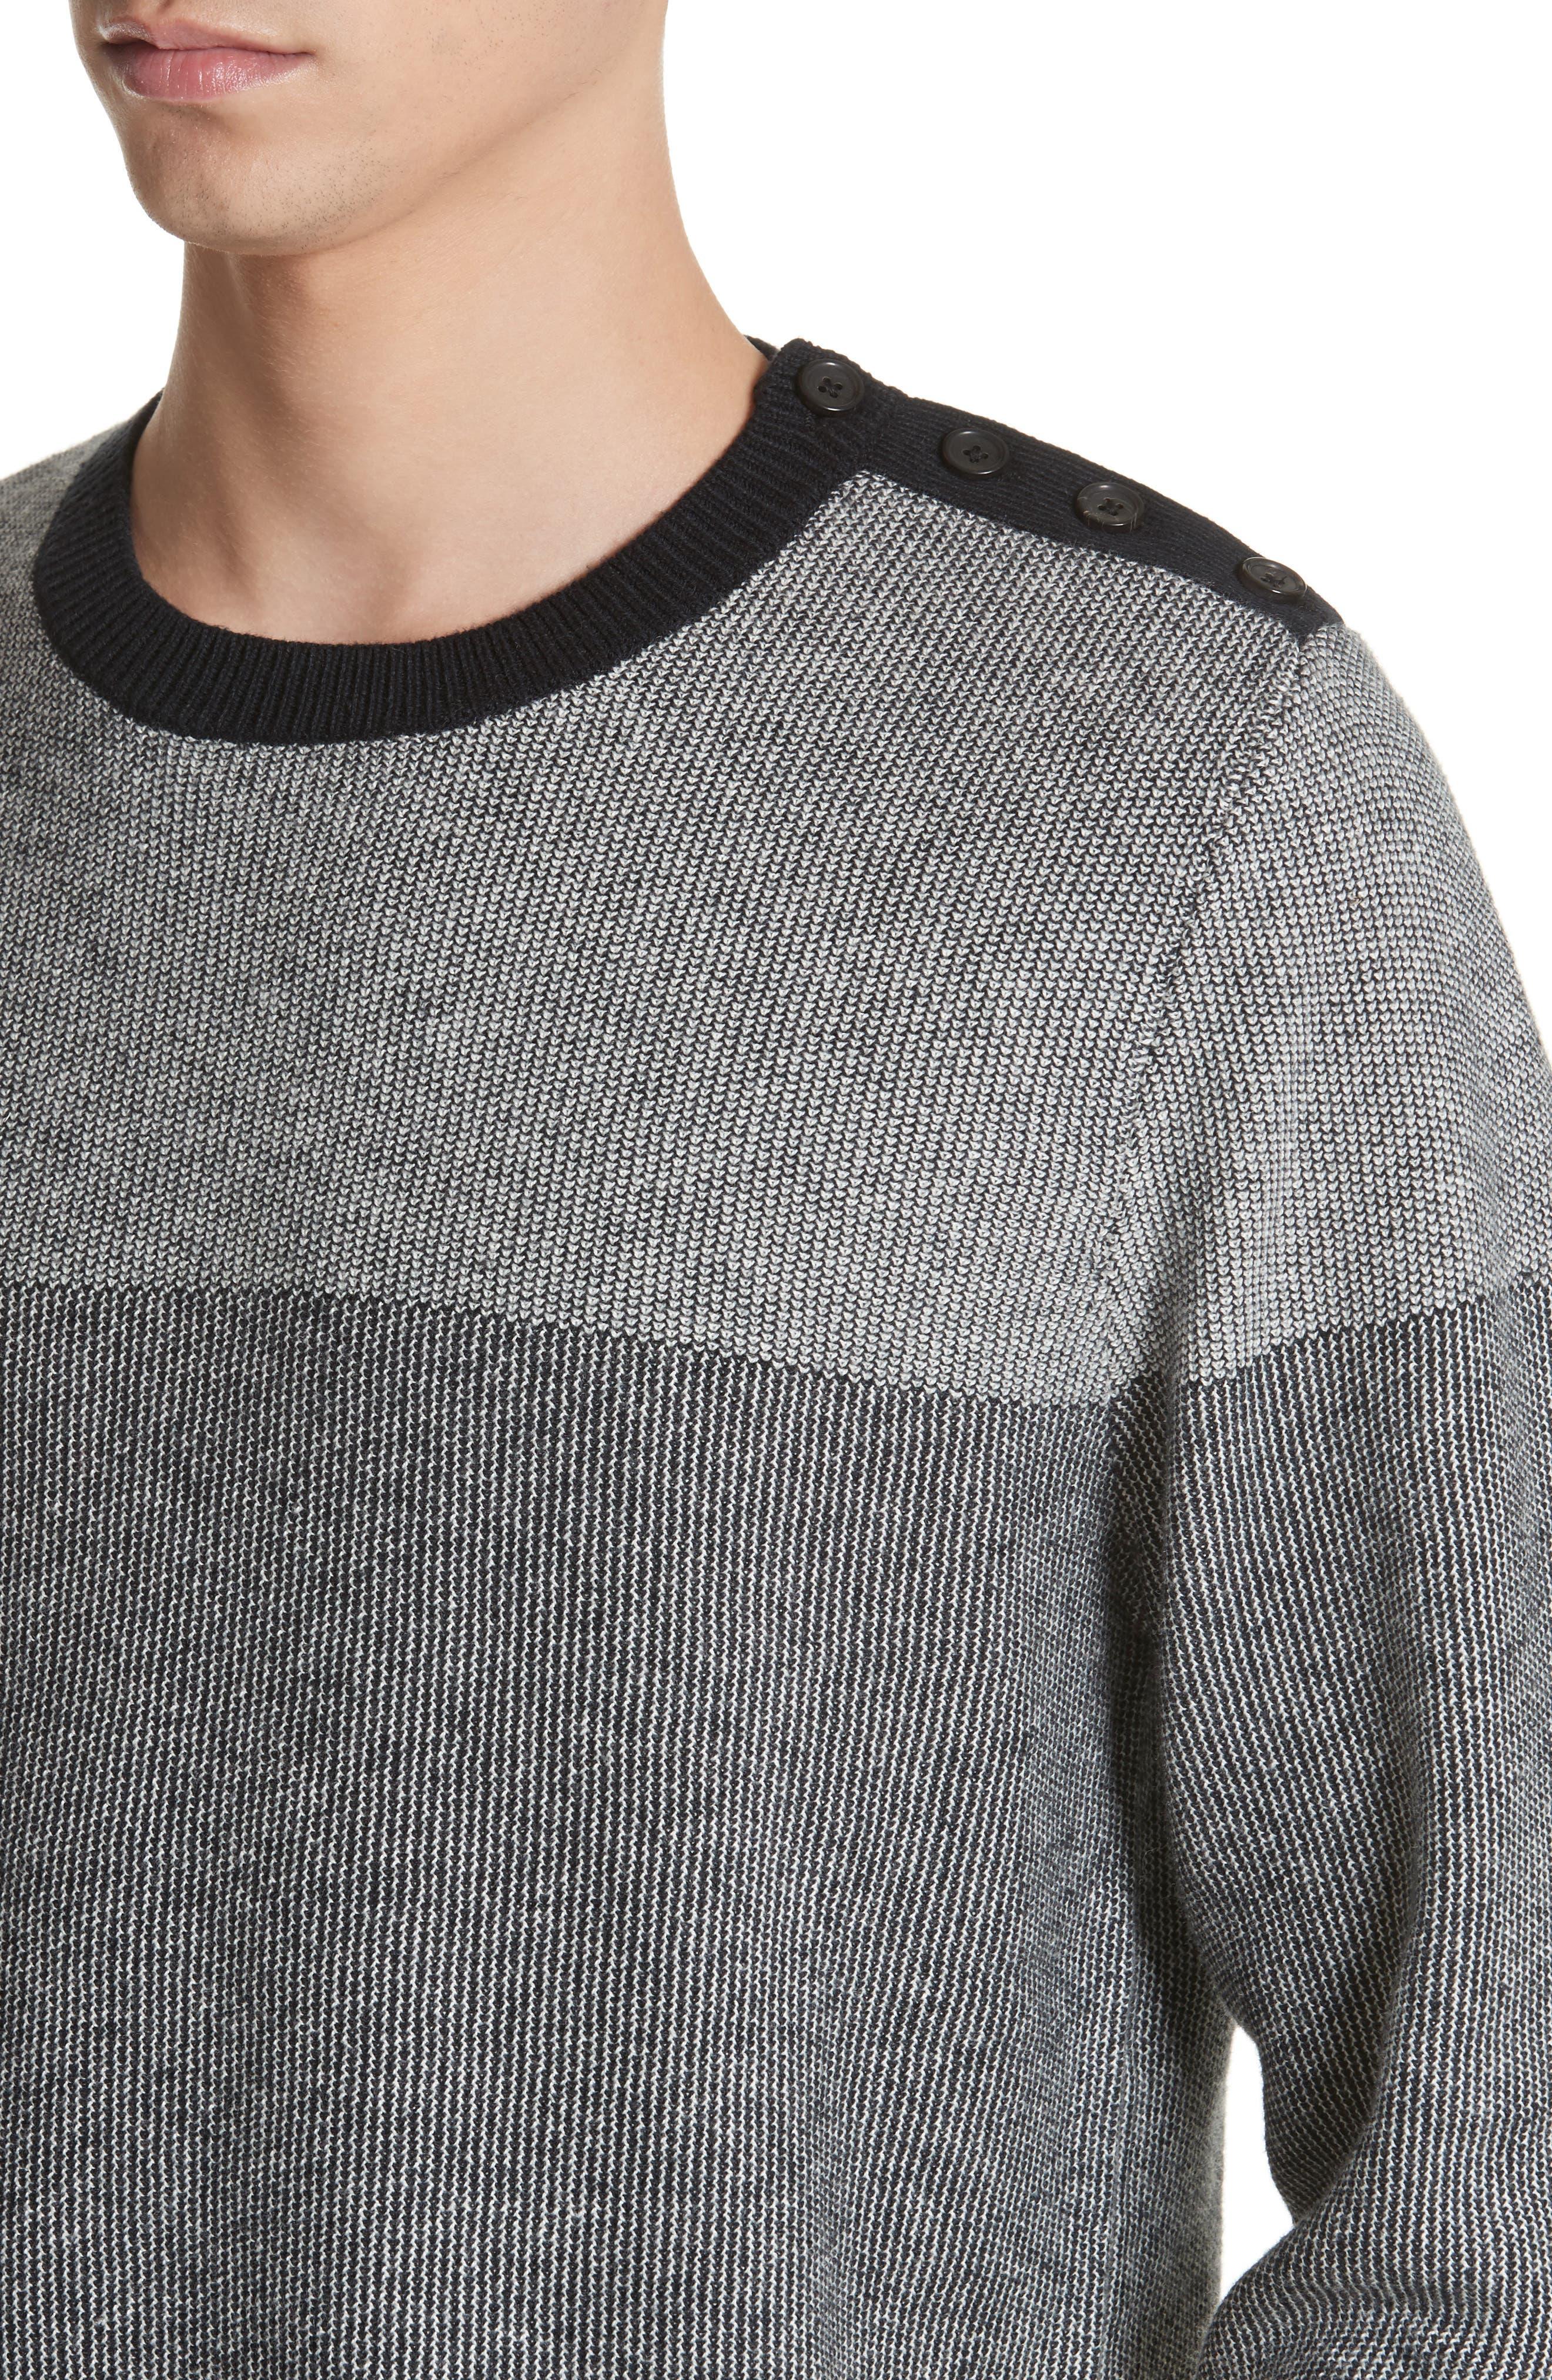 Colorblock Crewneck Sweater,                             Alternate thumbnail 4, color,                             001